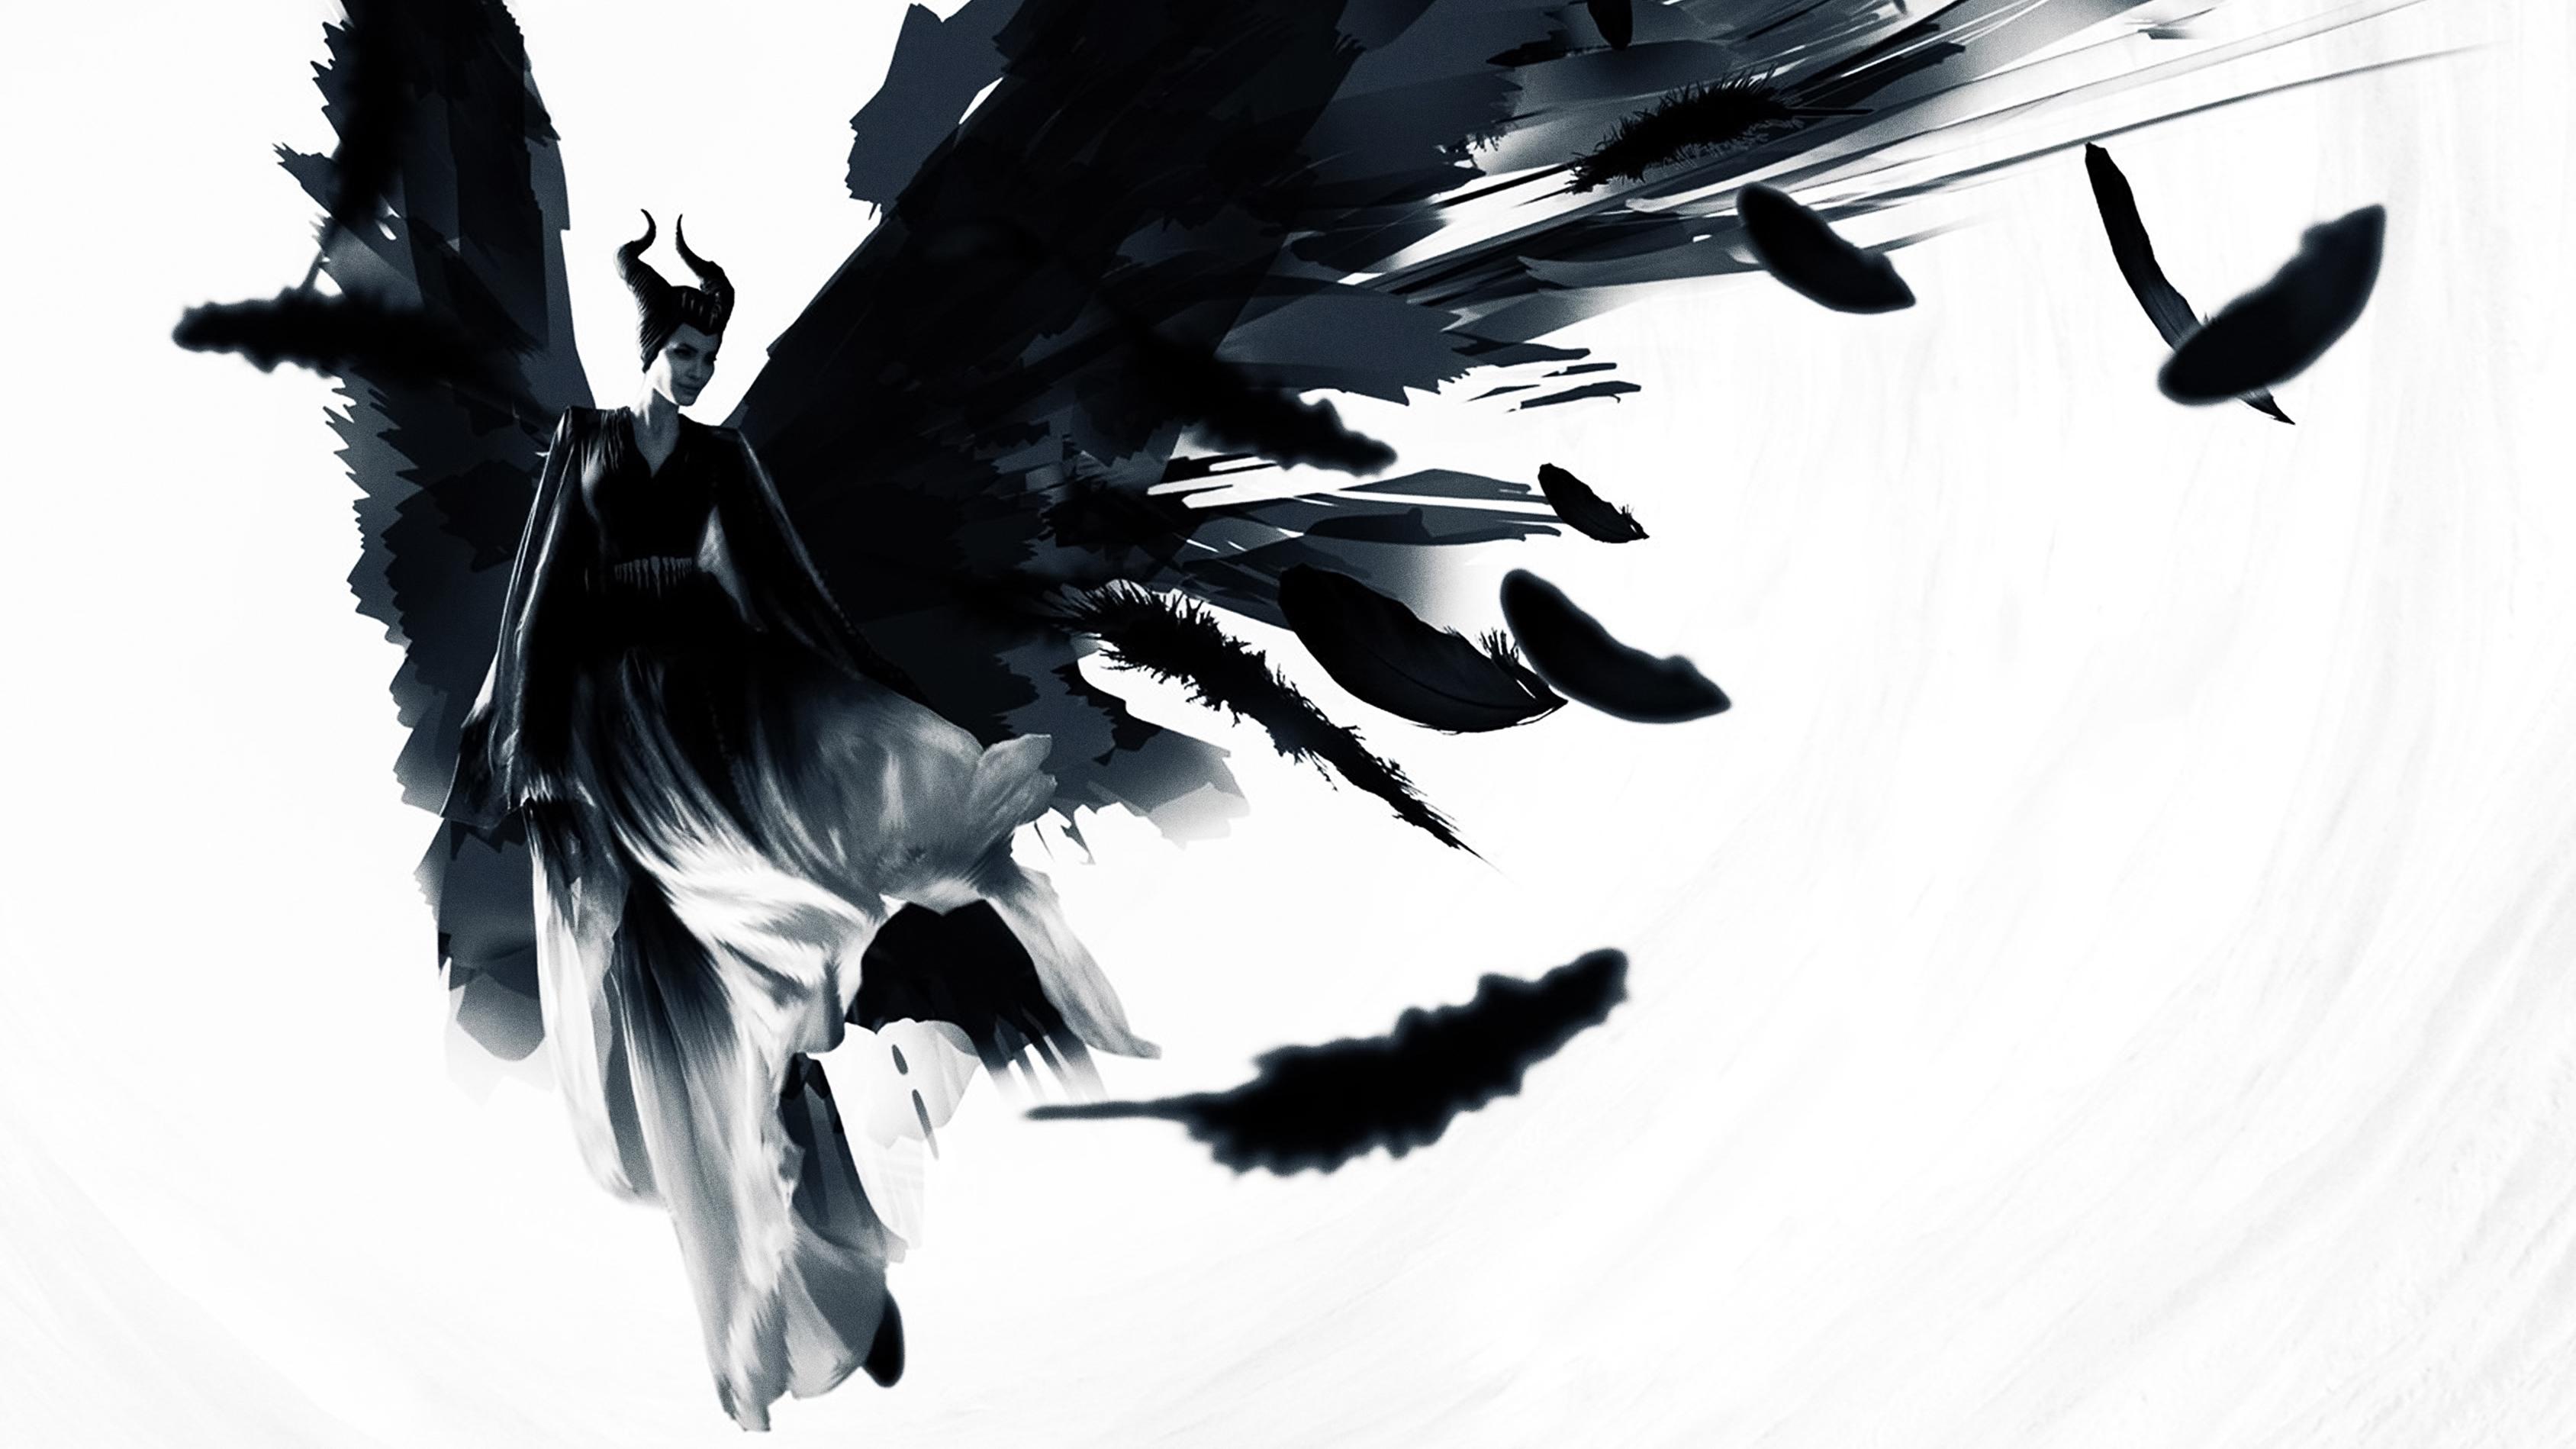 Maleficent Mistress Of Evil 4k Hd Movies 4k Wallpapers